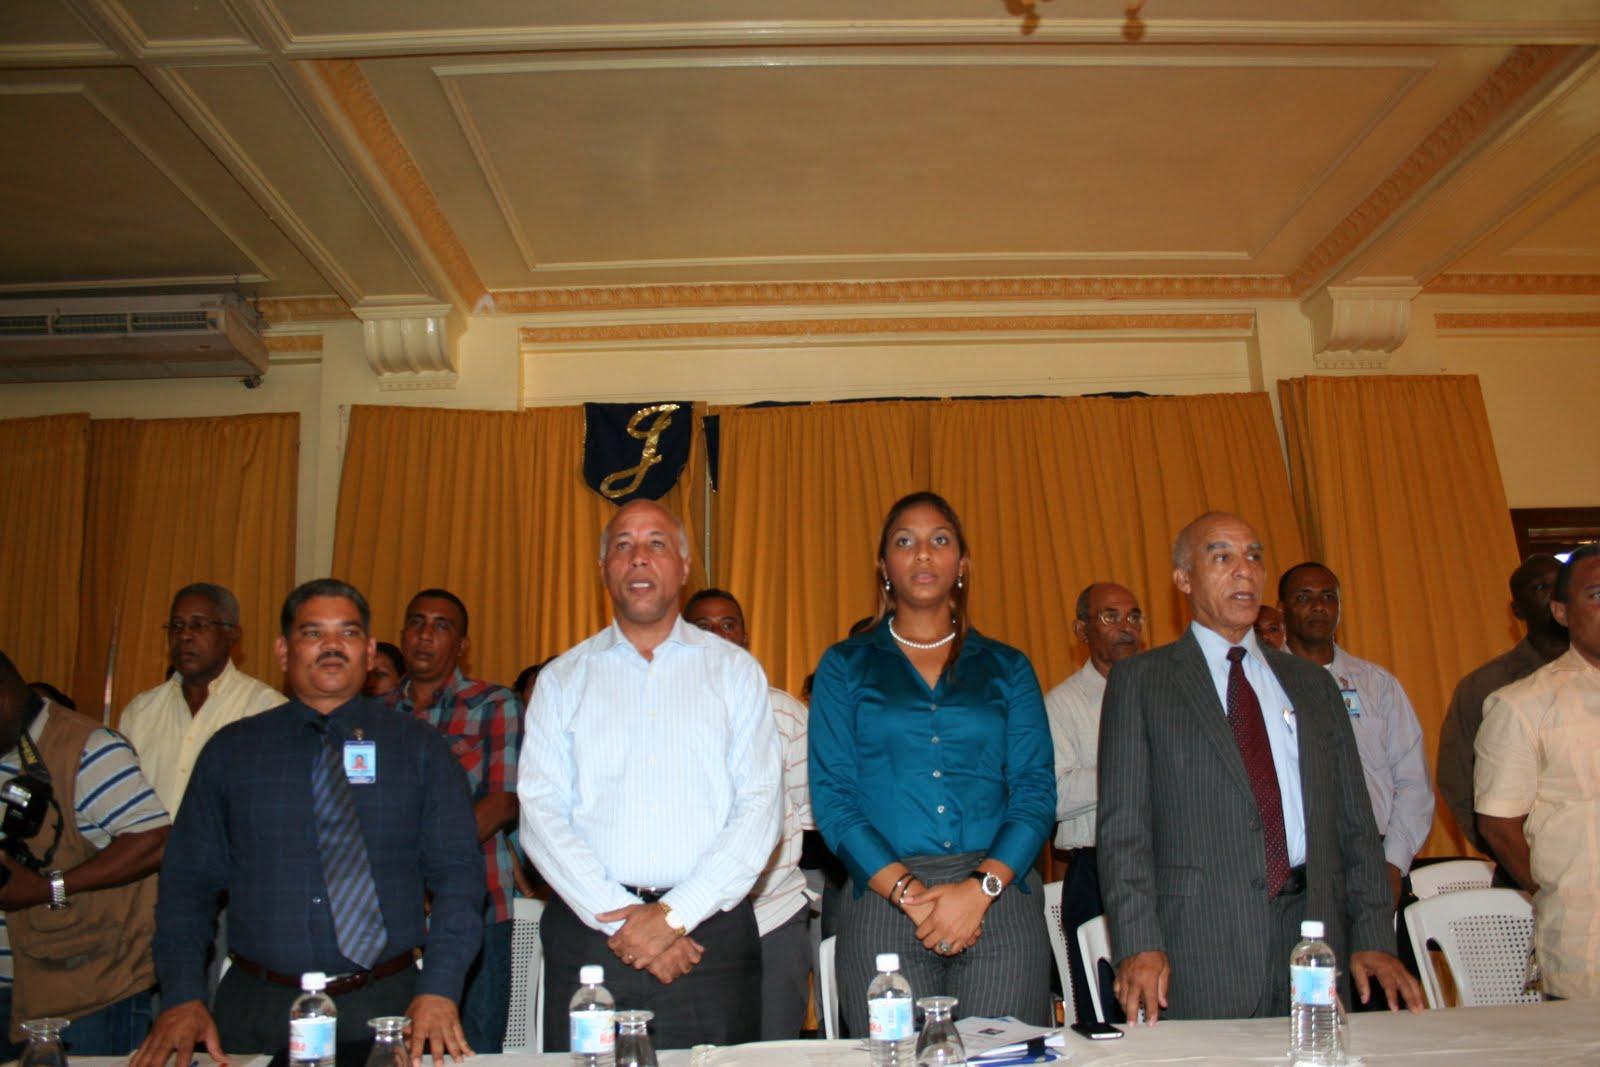 Ministerio de interior y polic a encabeza acto seguridad for Ministerio interior y policia